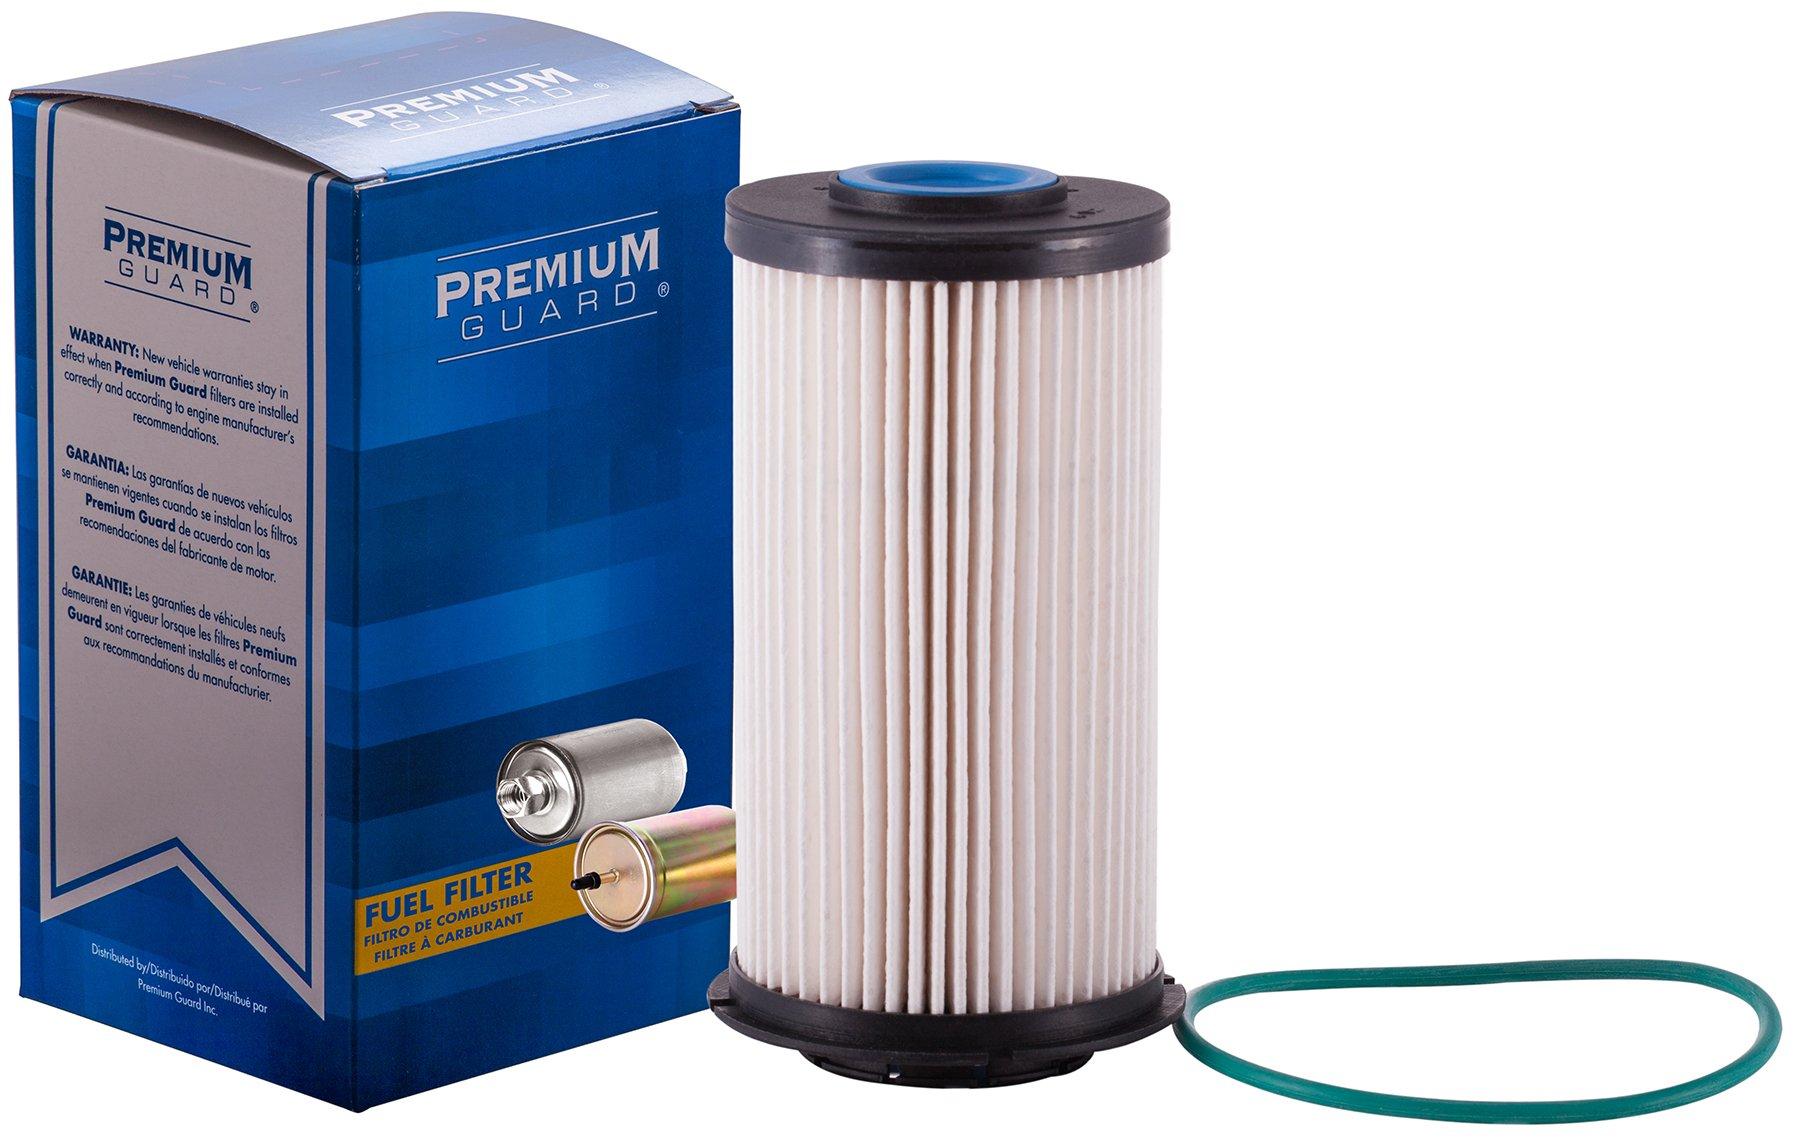 PG Diesel Fuel Filter DF99119 | Fits 2014-18 Ram 1500, 3.0L ECO, 2019 1500 Classic